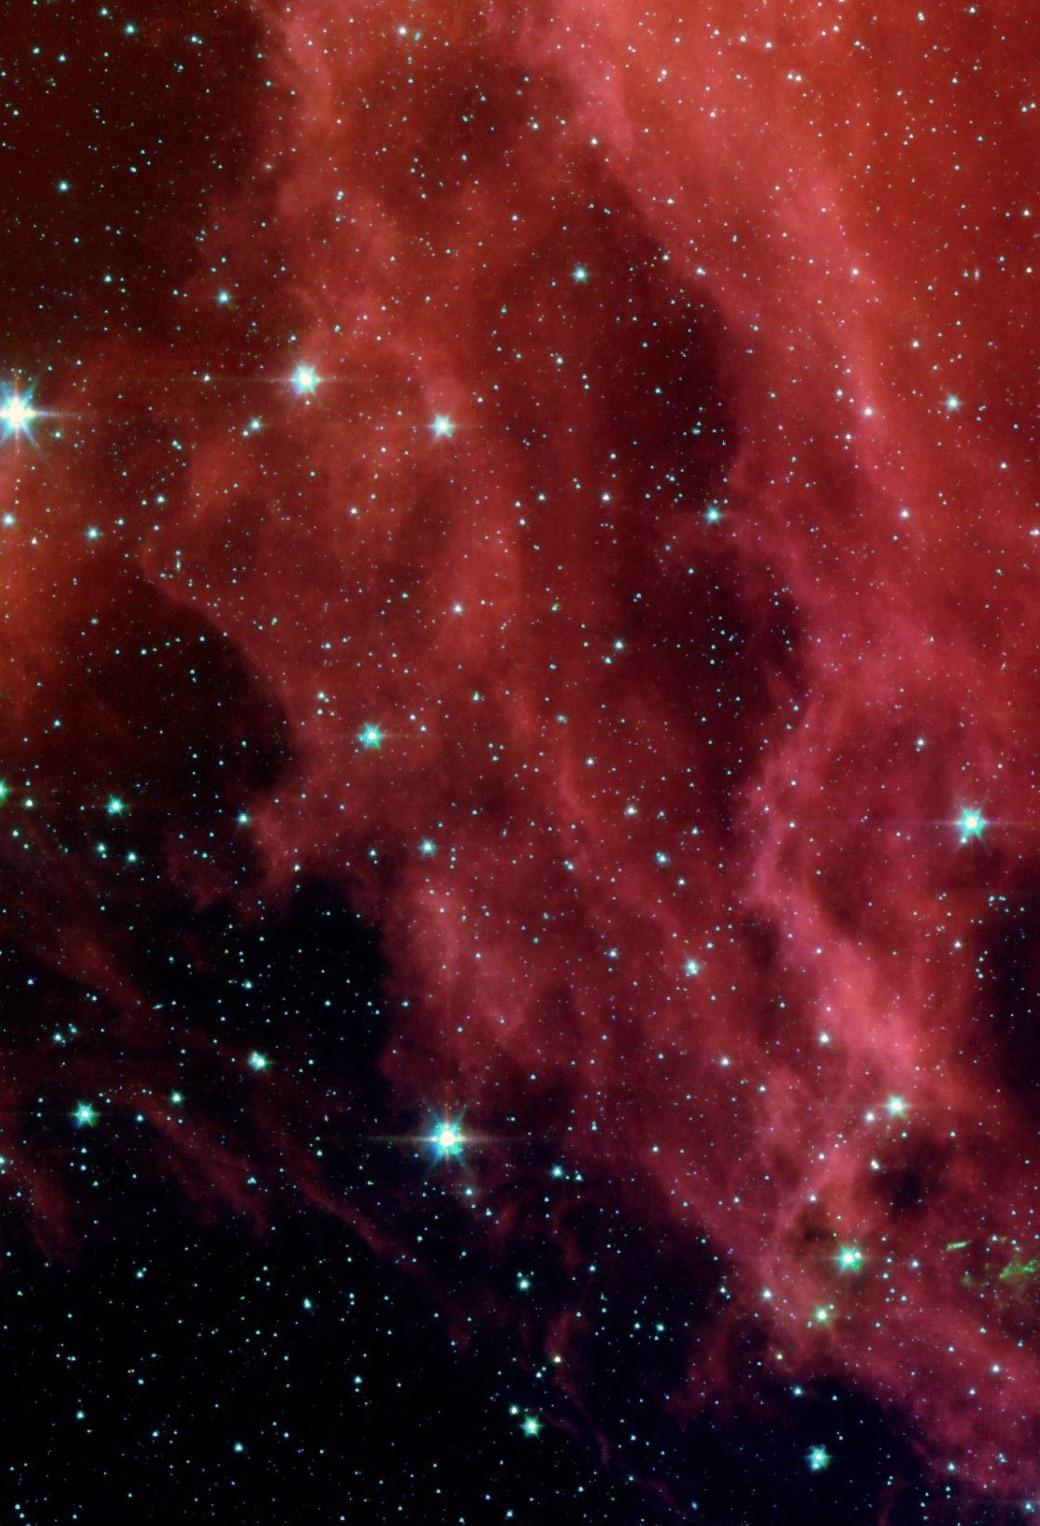 Fantastic Wallpaper Night Ios - bYq4Tx  HD-38270.jpg